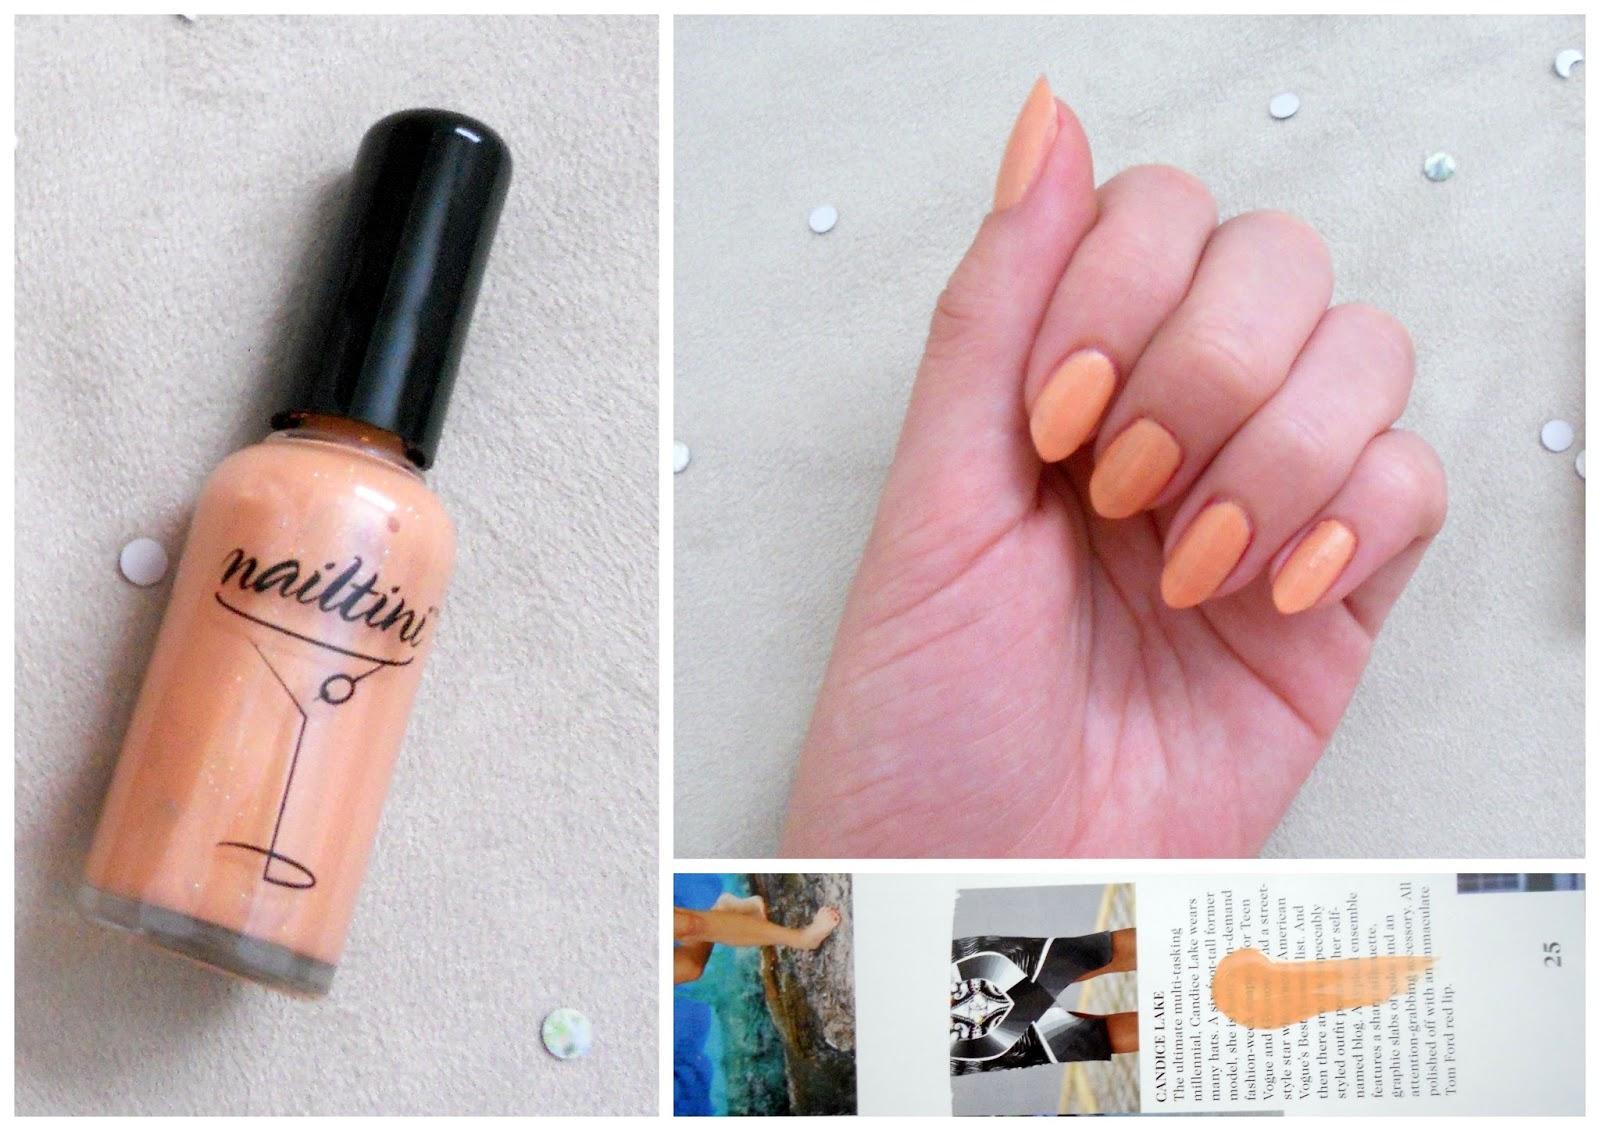 tini cosmetics nailtini polish in mango rita, review, summer manicure, fall transitioning nails